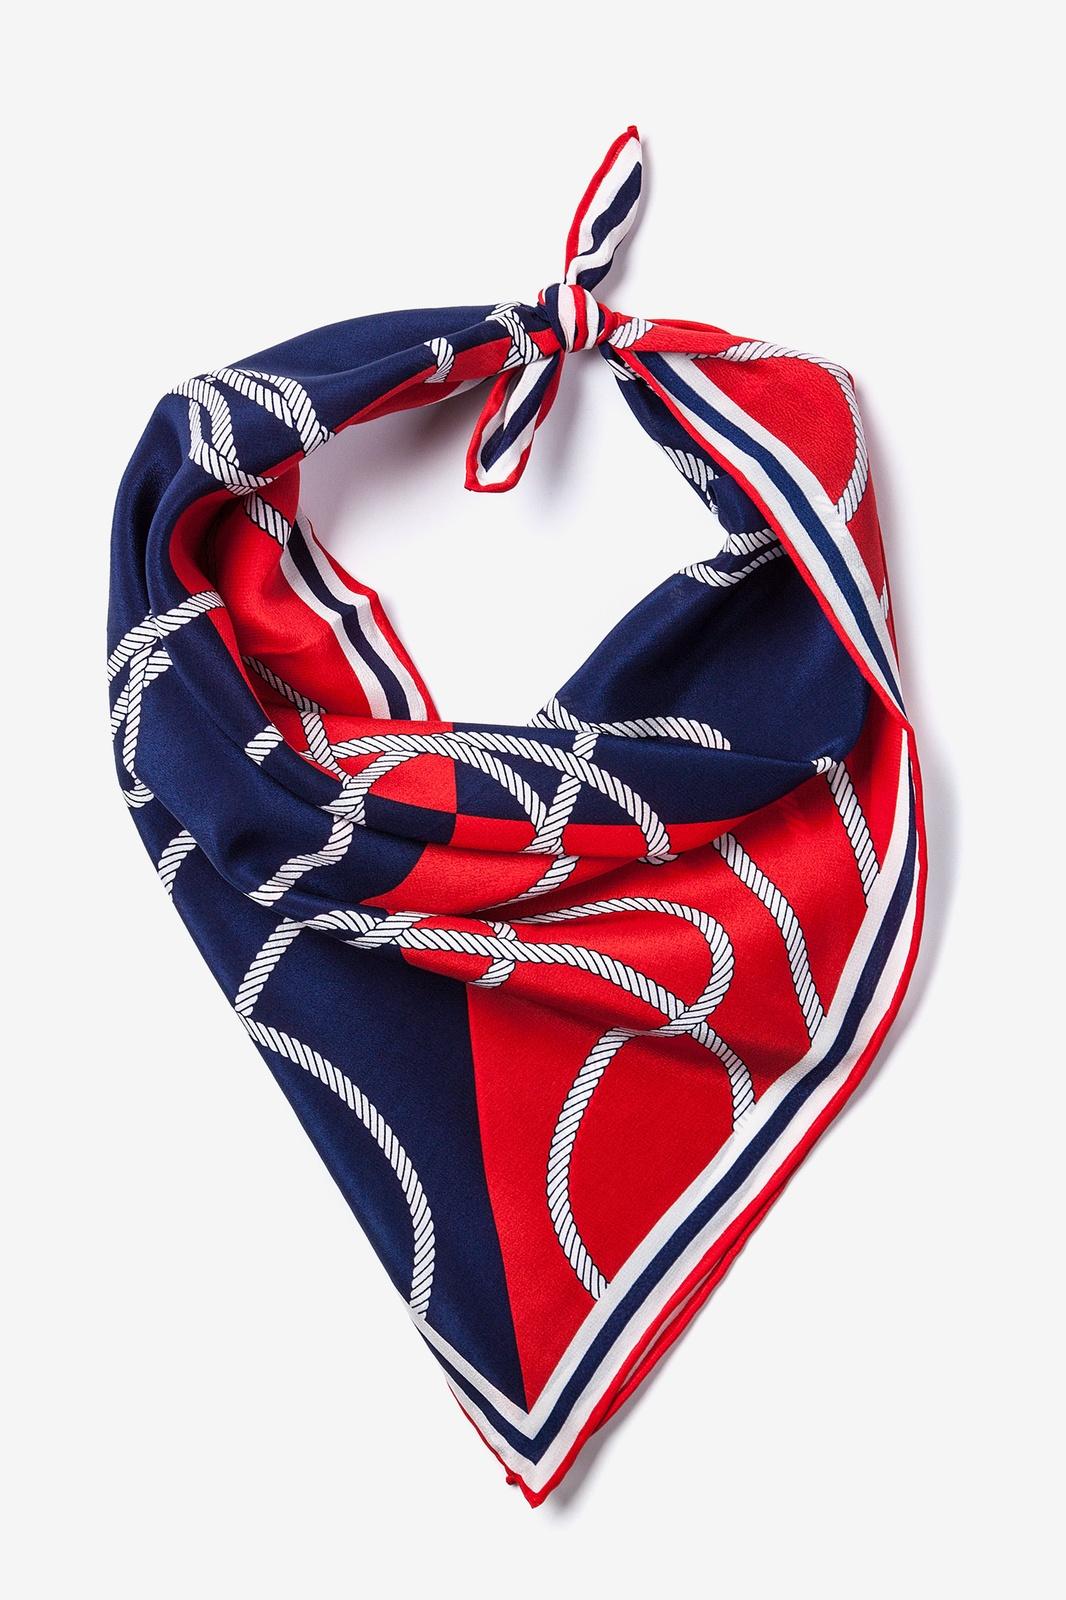 navy-blue-silk-feeling-knotty-neckerchief-238120-105-1600-0.jpg